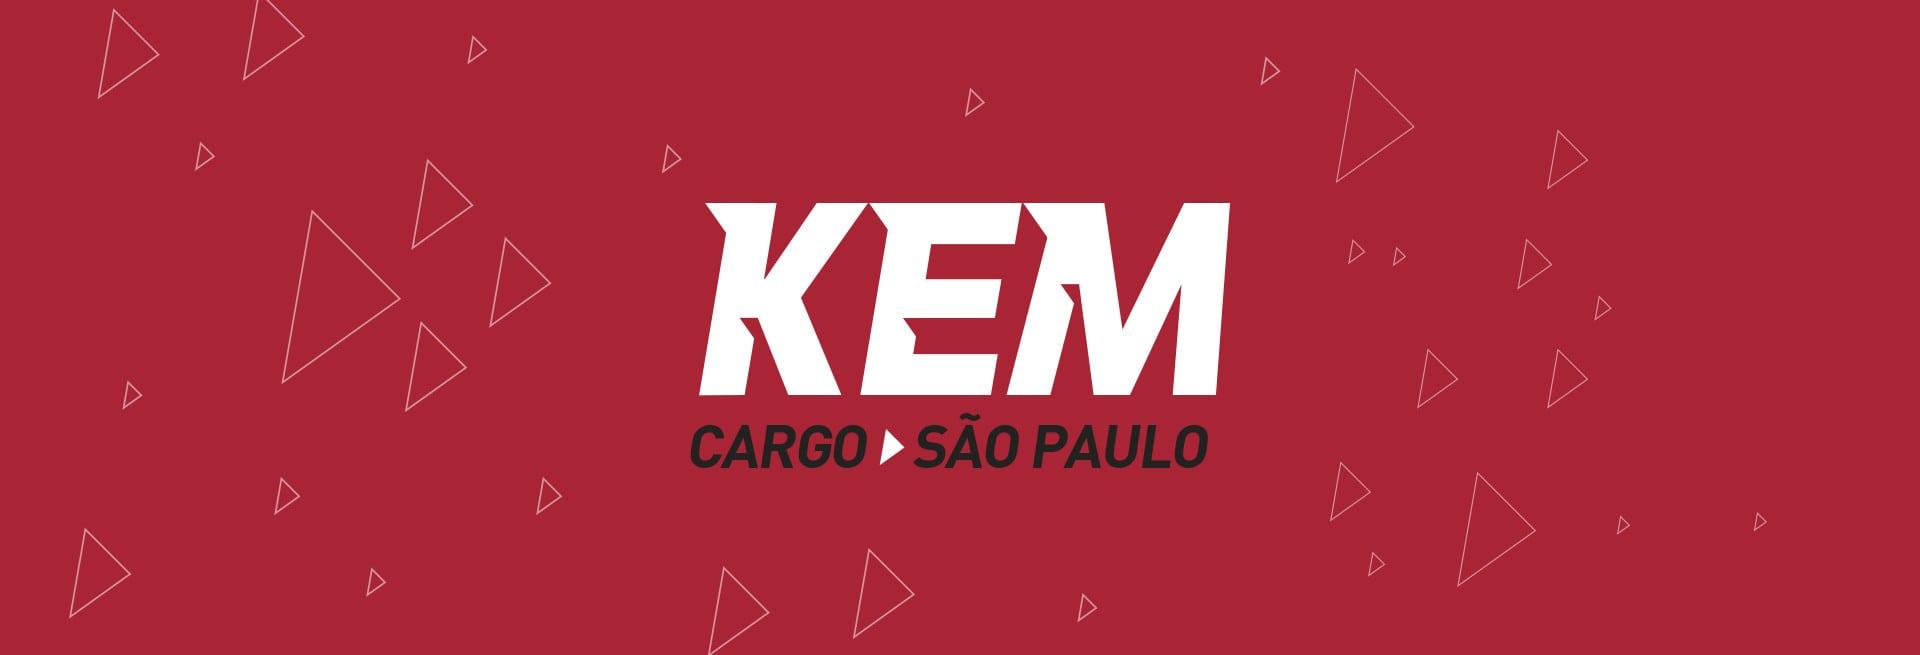 Logotipo Kemcargo